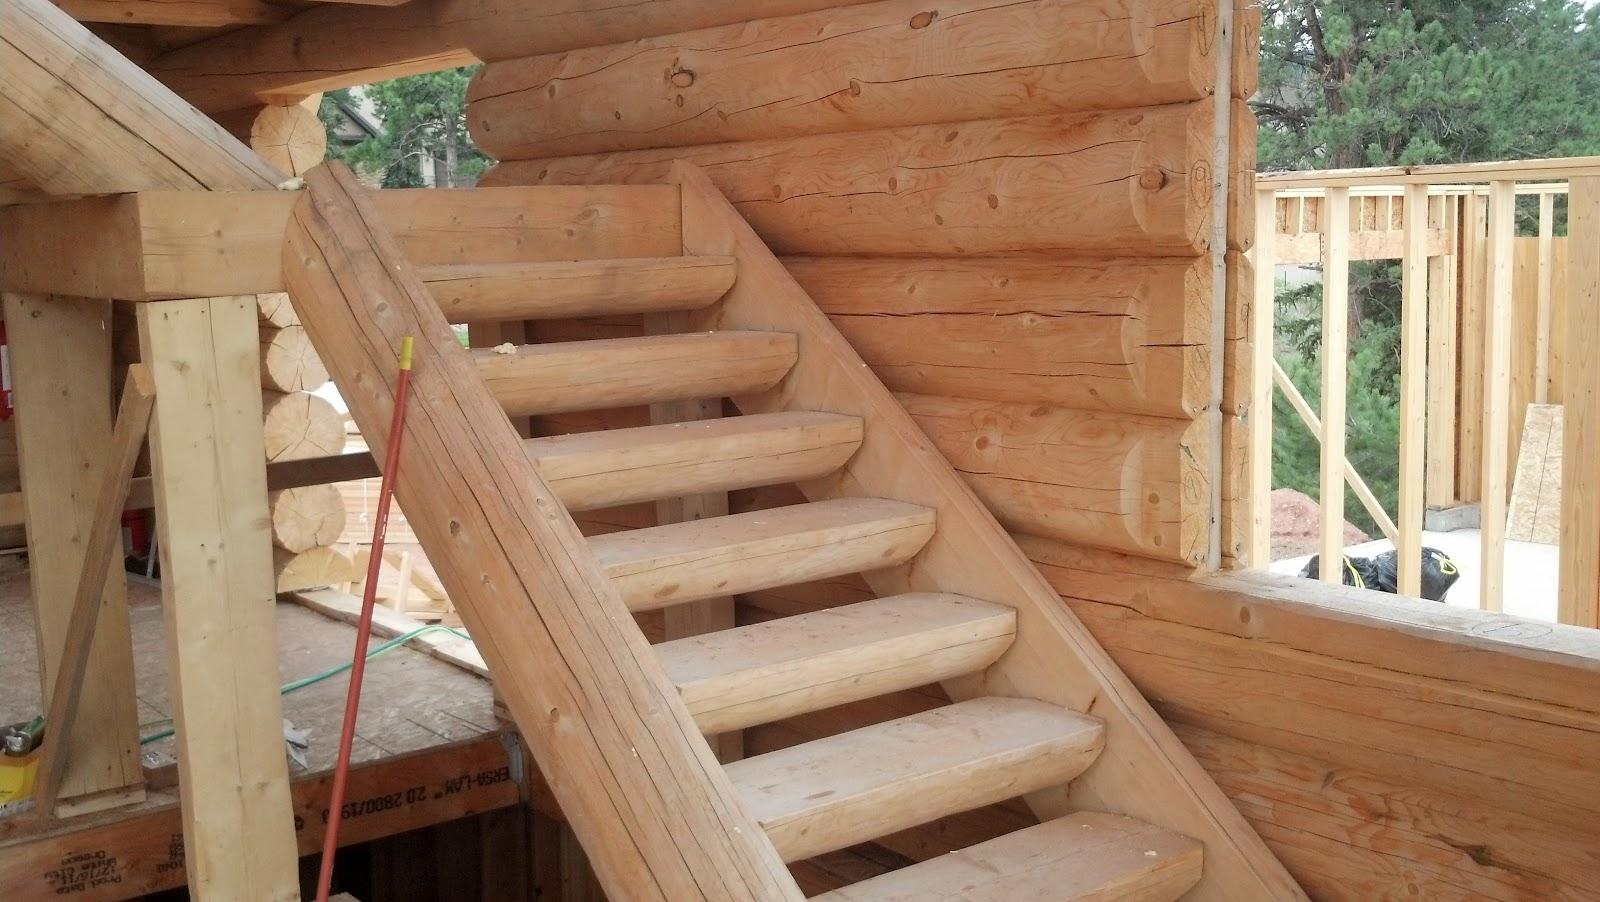 Stannard Log Home July 2012